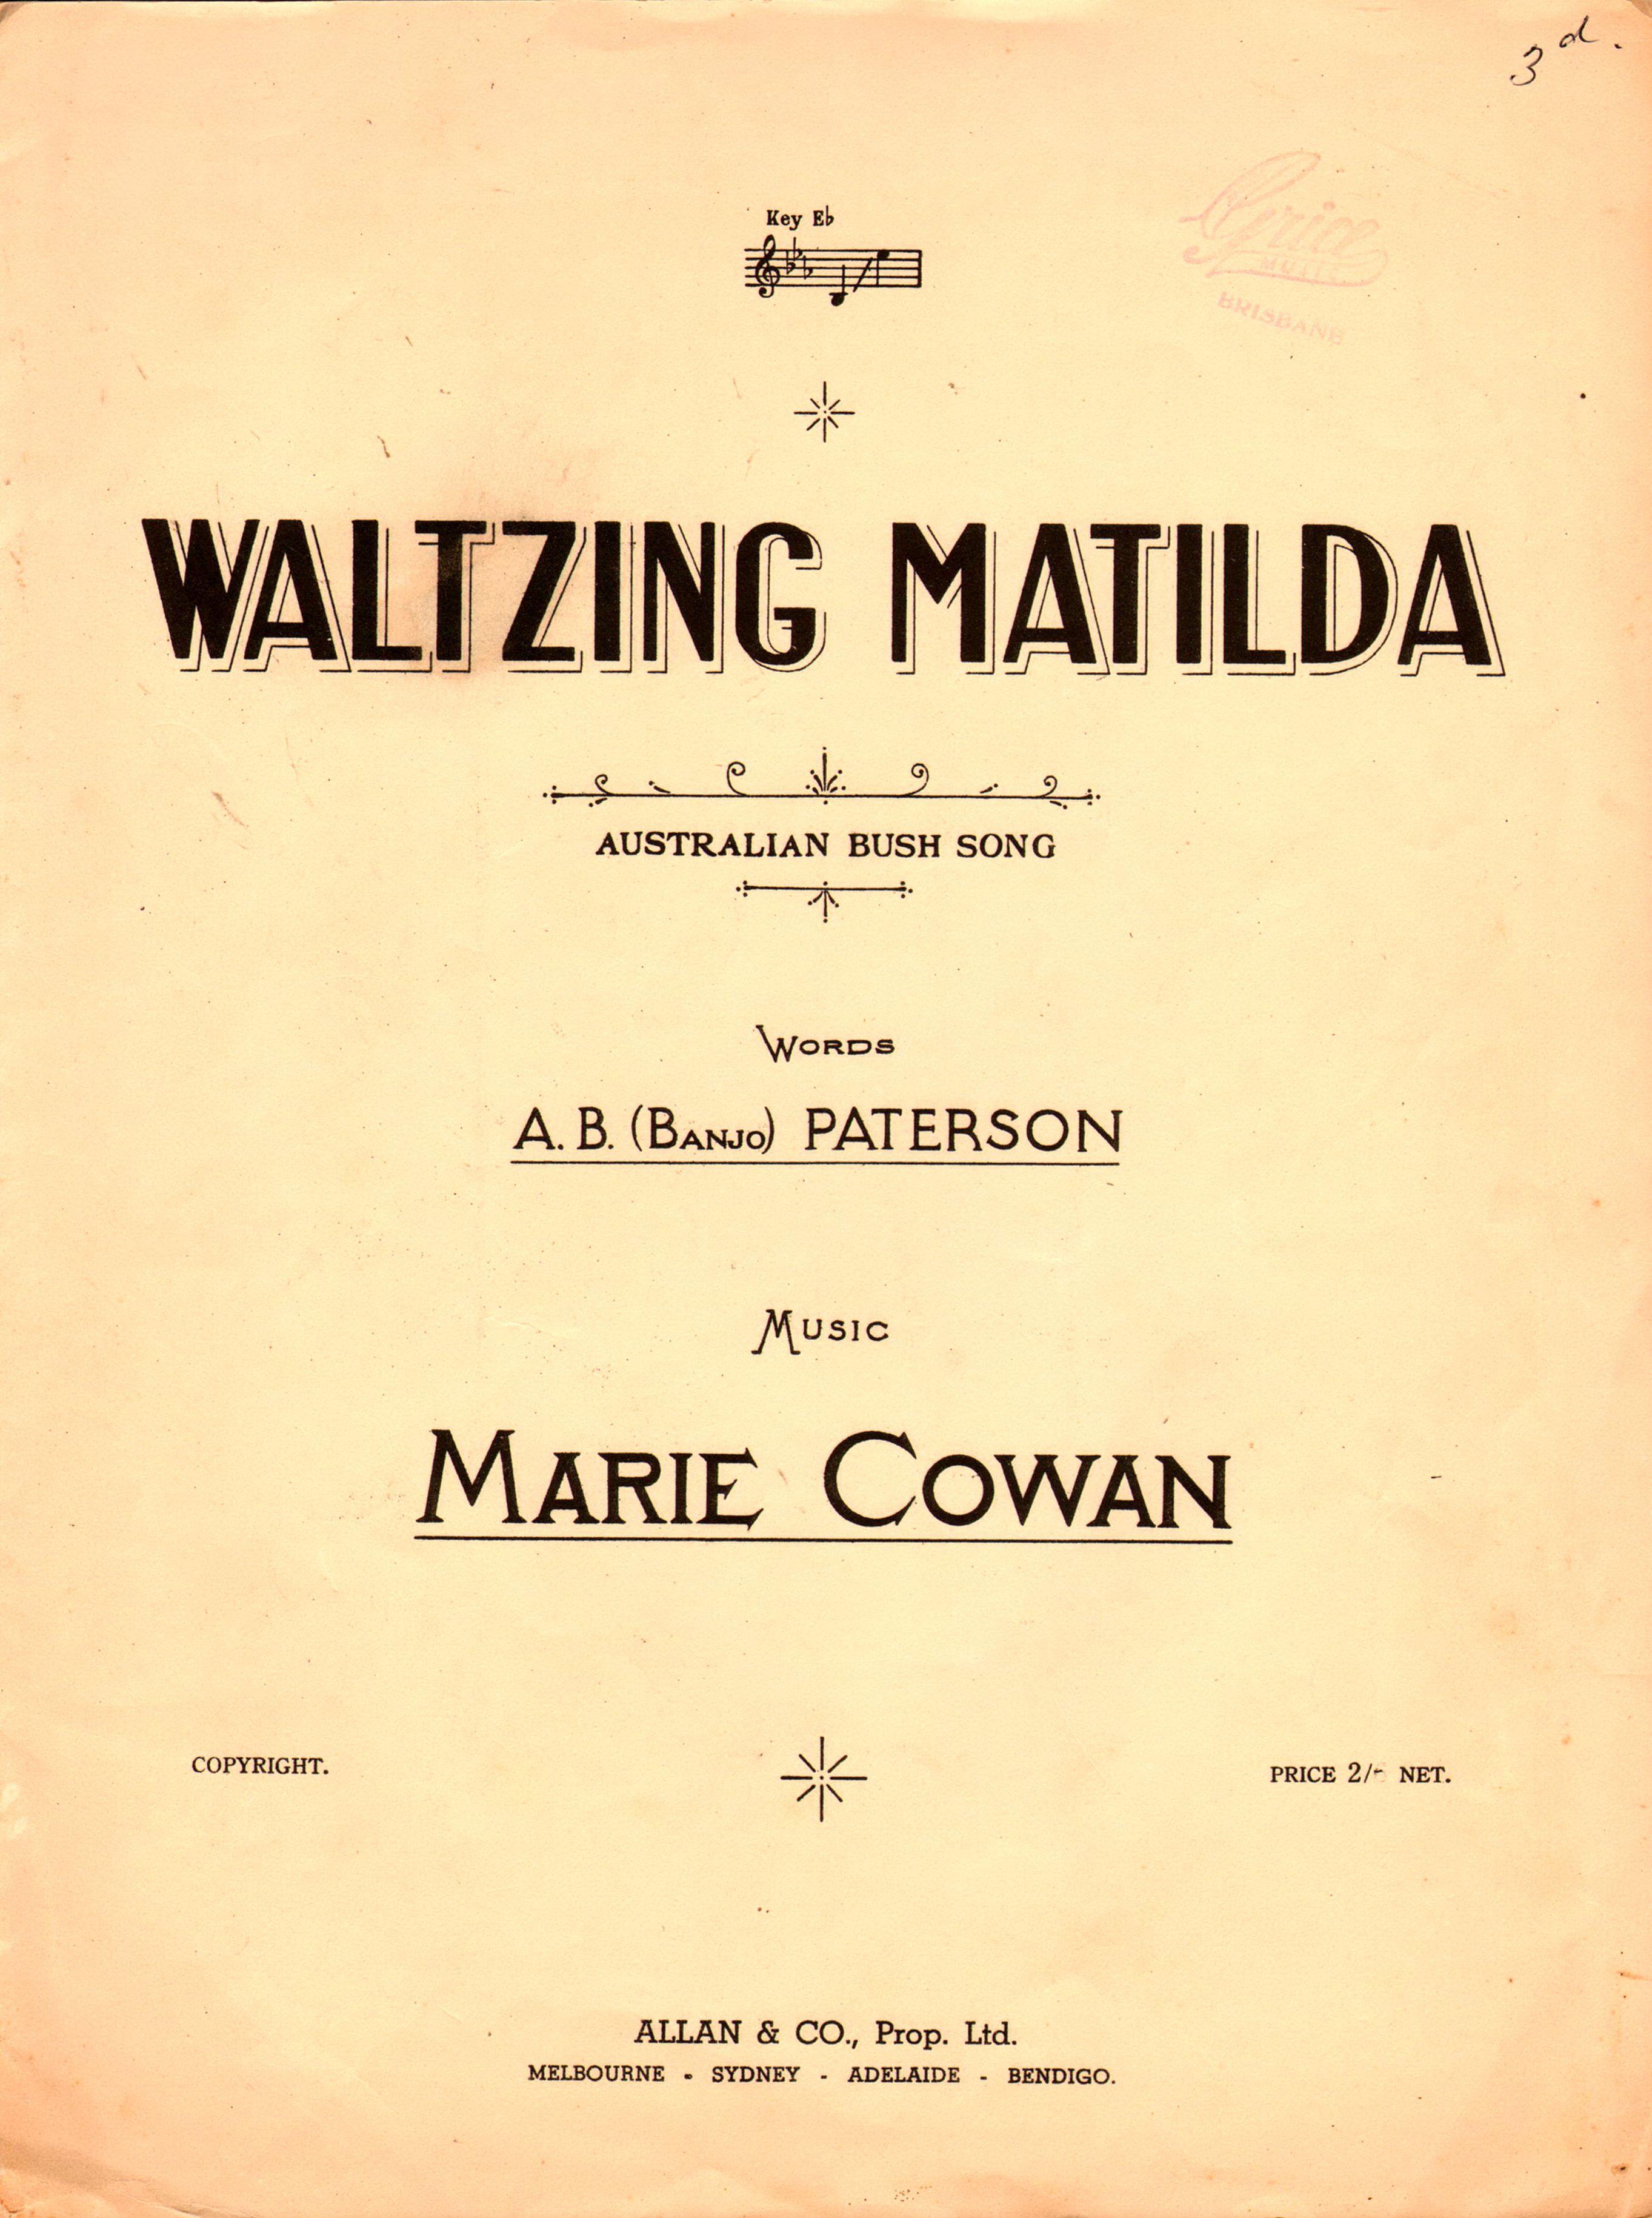 Waltzing Matilda. 1936. Words by A.B.(Banjo) Paterson